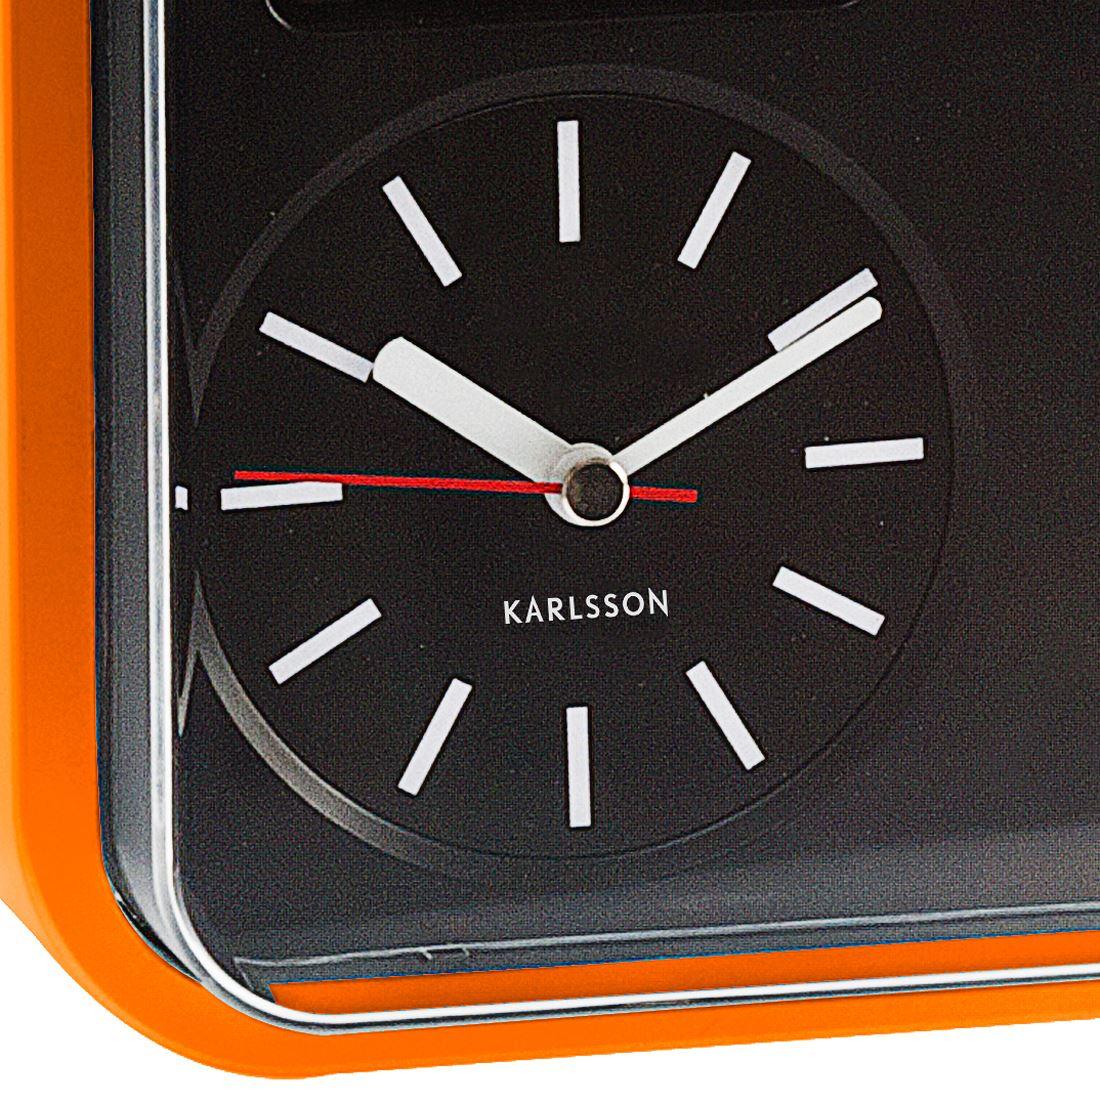 Karlsson Big Flip Amp Mini Flip Retro Wall Clocks With Day